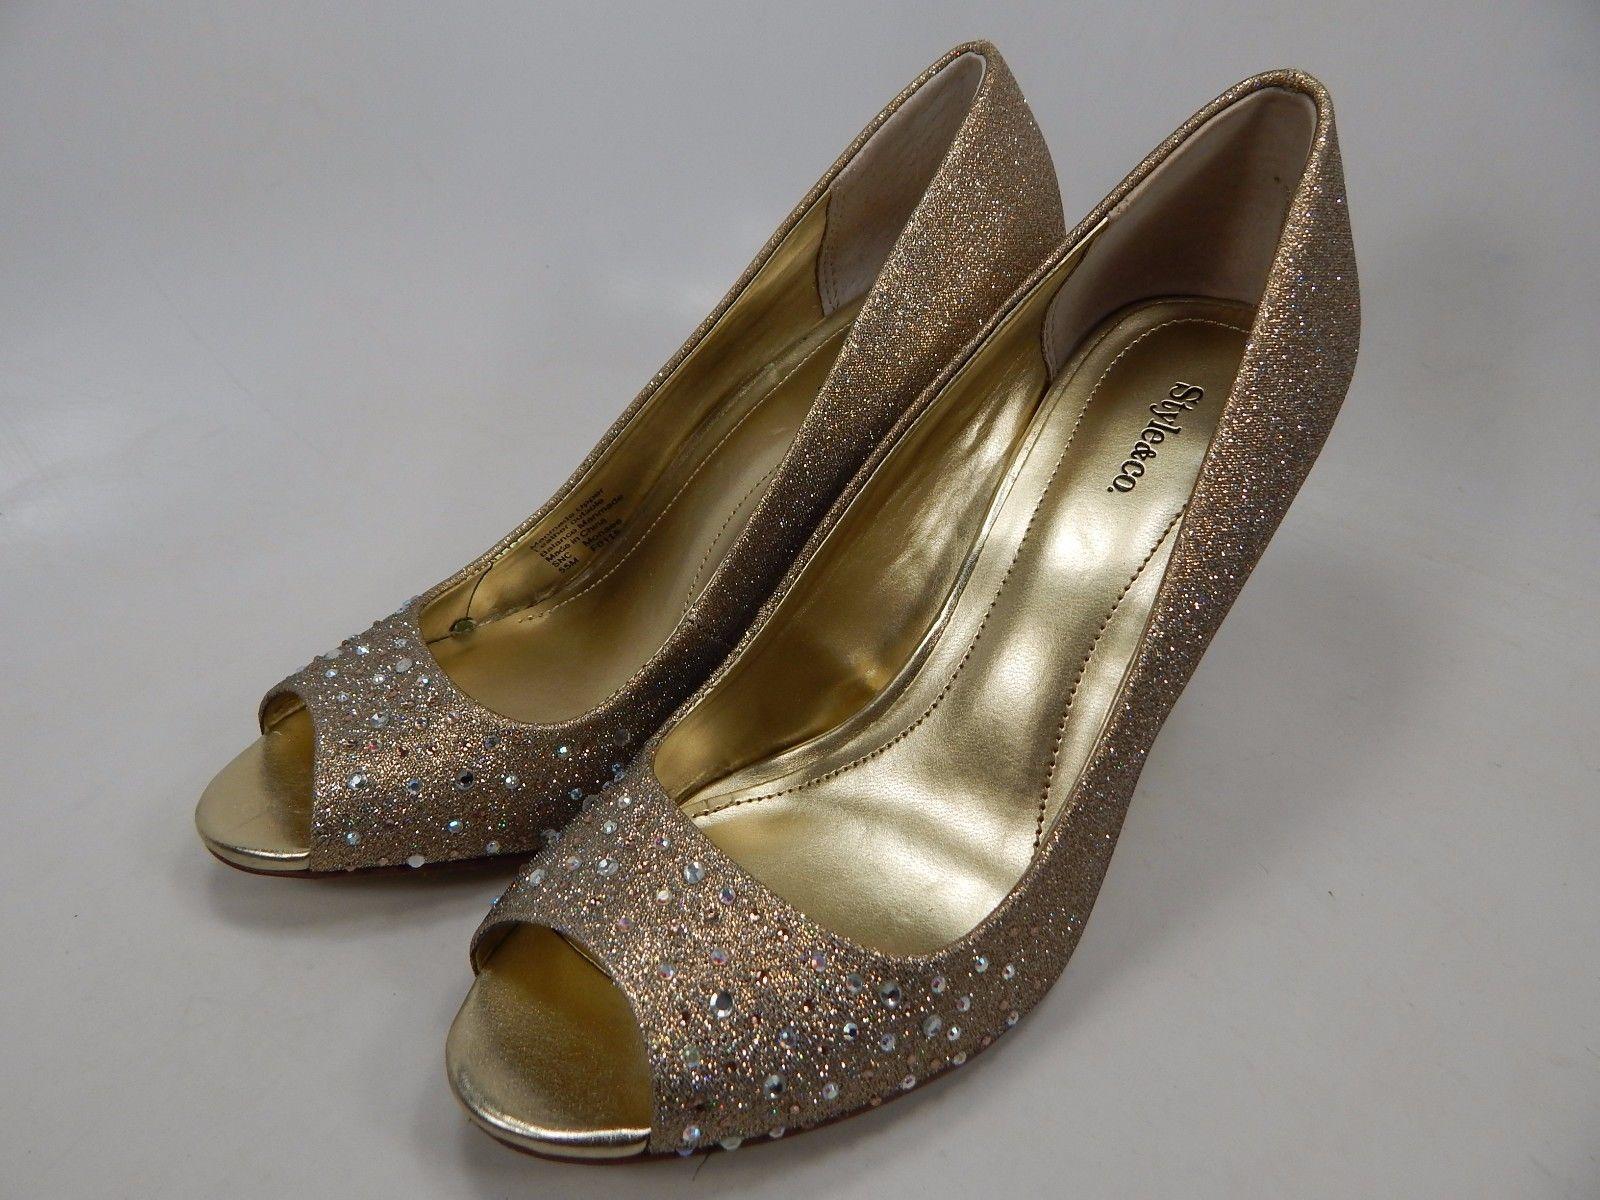 Style & Co Monaee Peep Toe High Heels Pumps Women's Size US 5.5 Gold $65